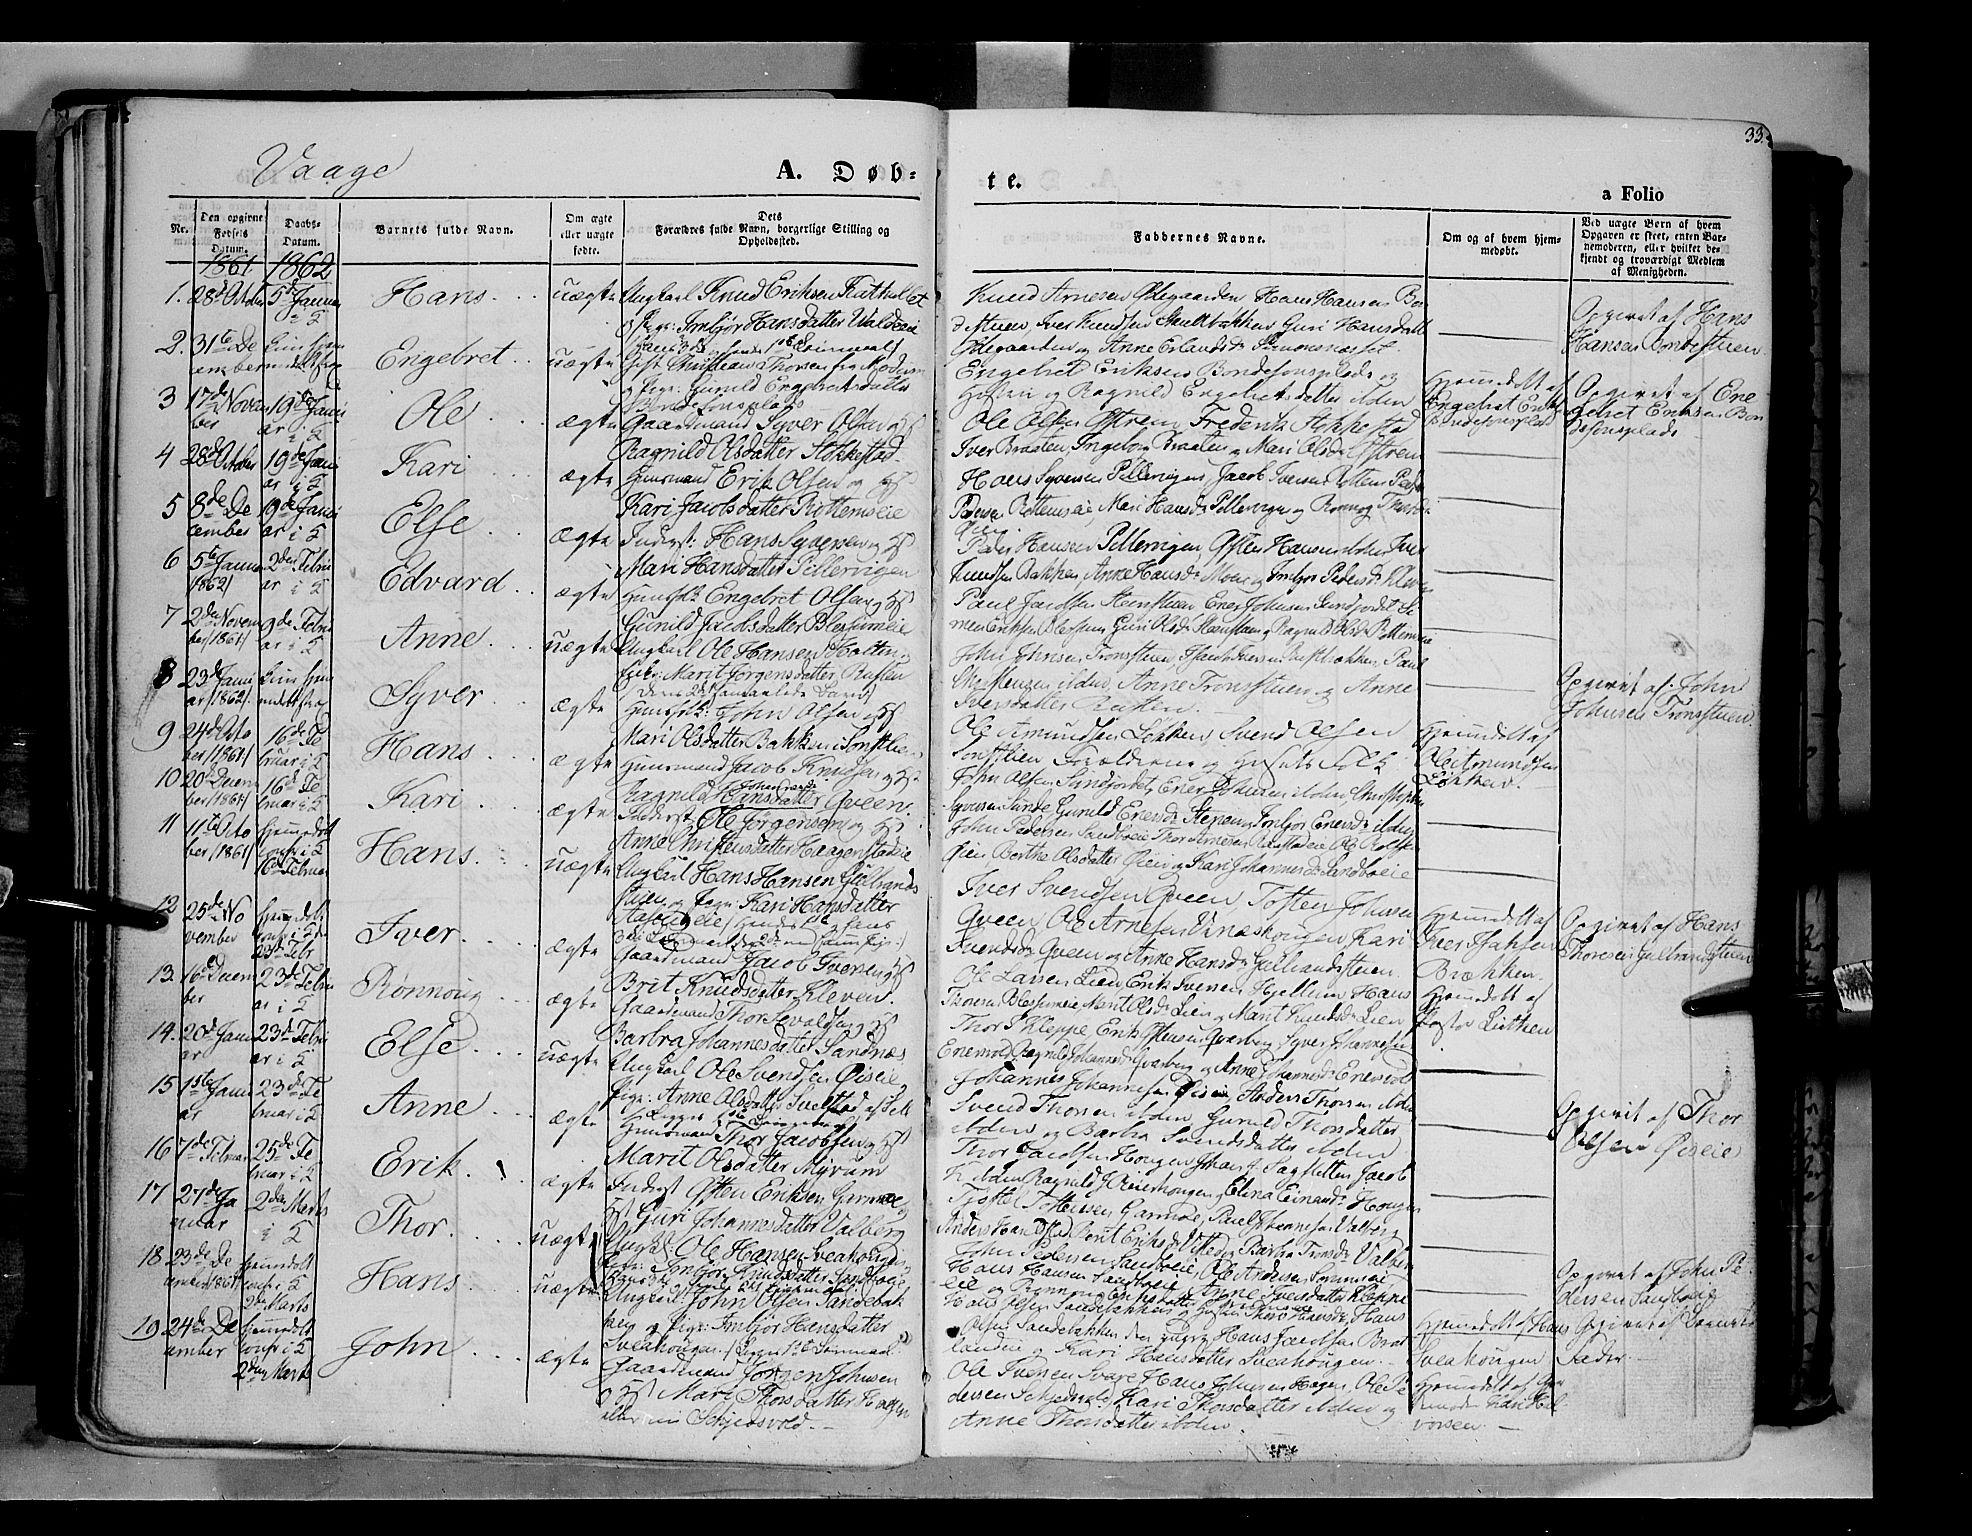 SAH, Vågå prestekontor, Ministerialbok nr. 6 /1, 1856-1872, s. 33